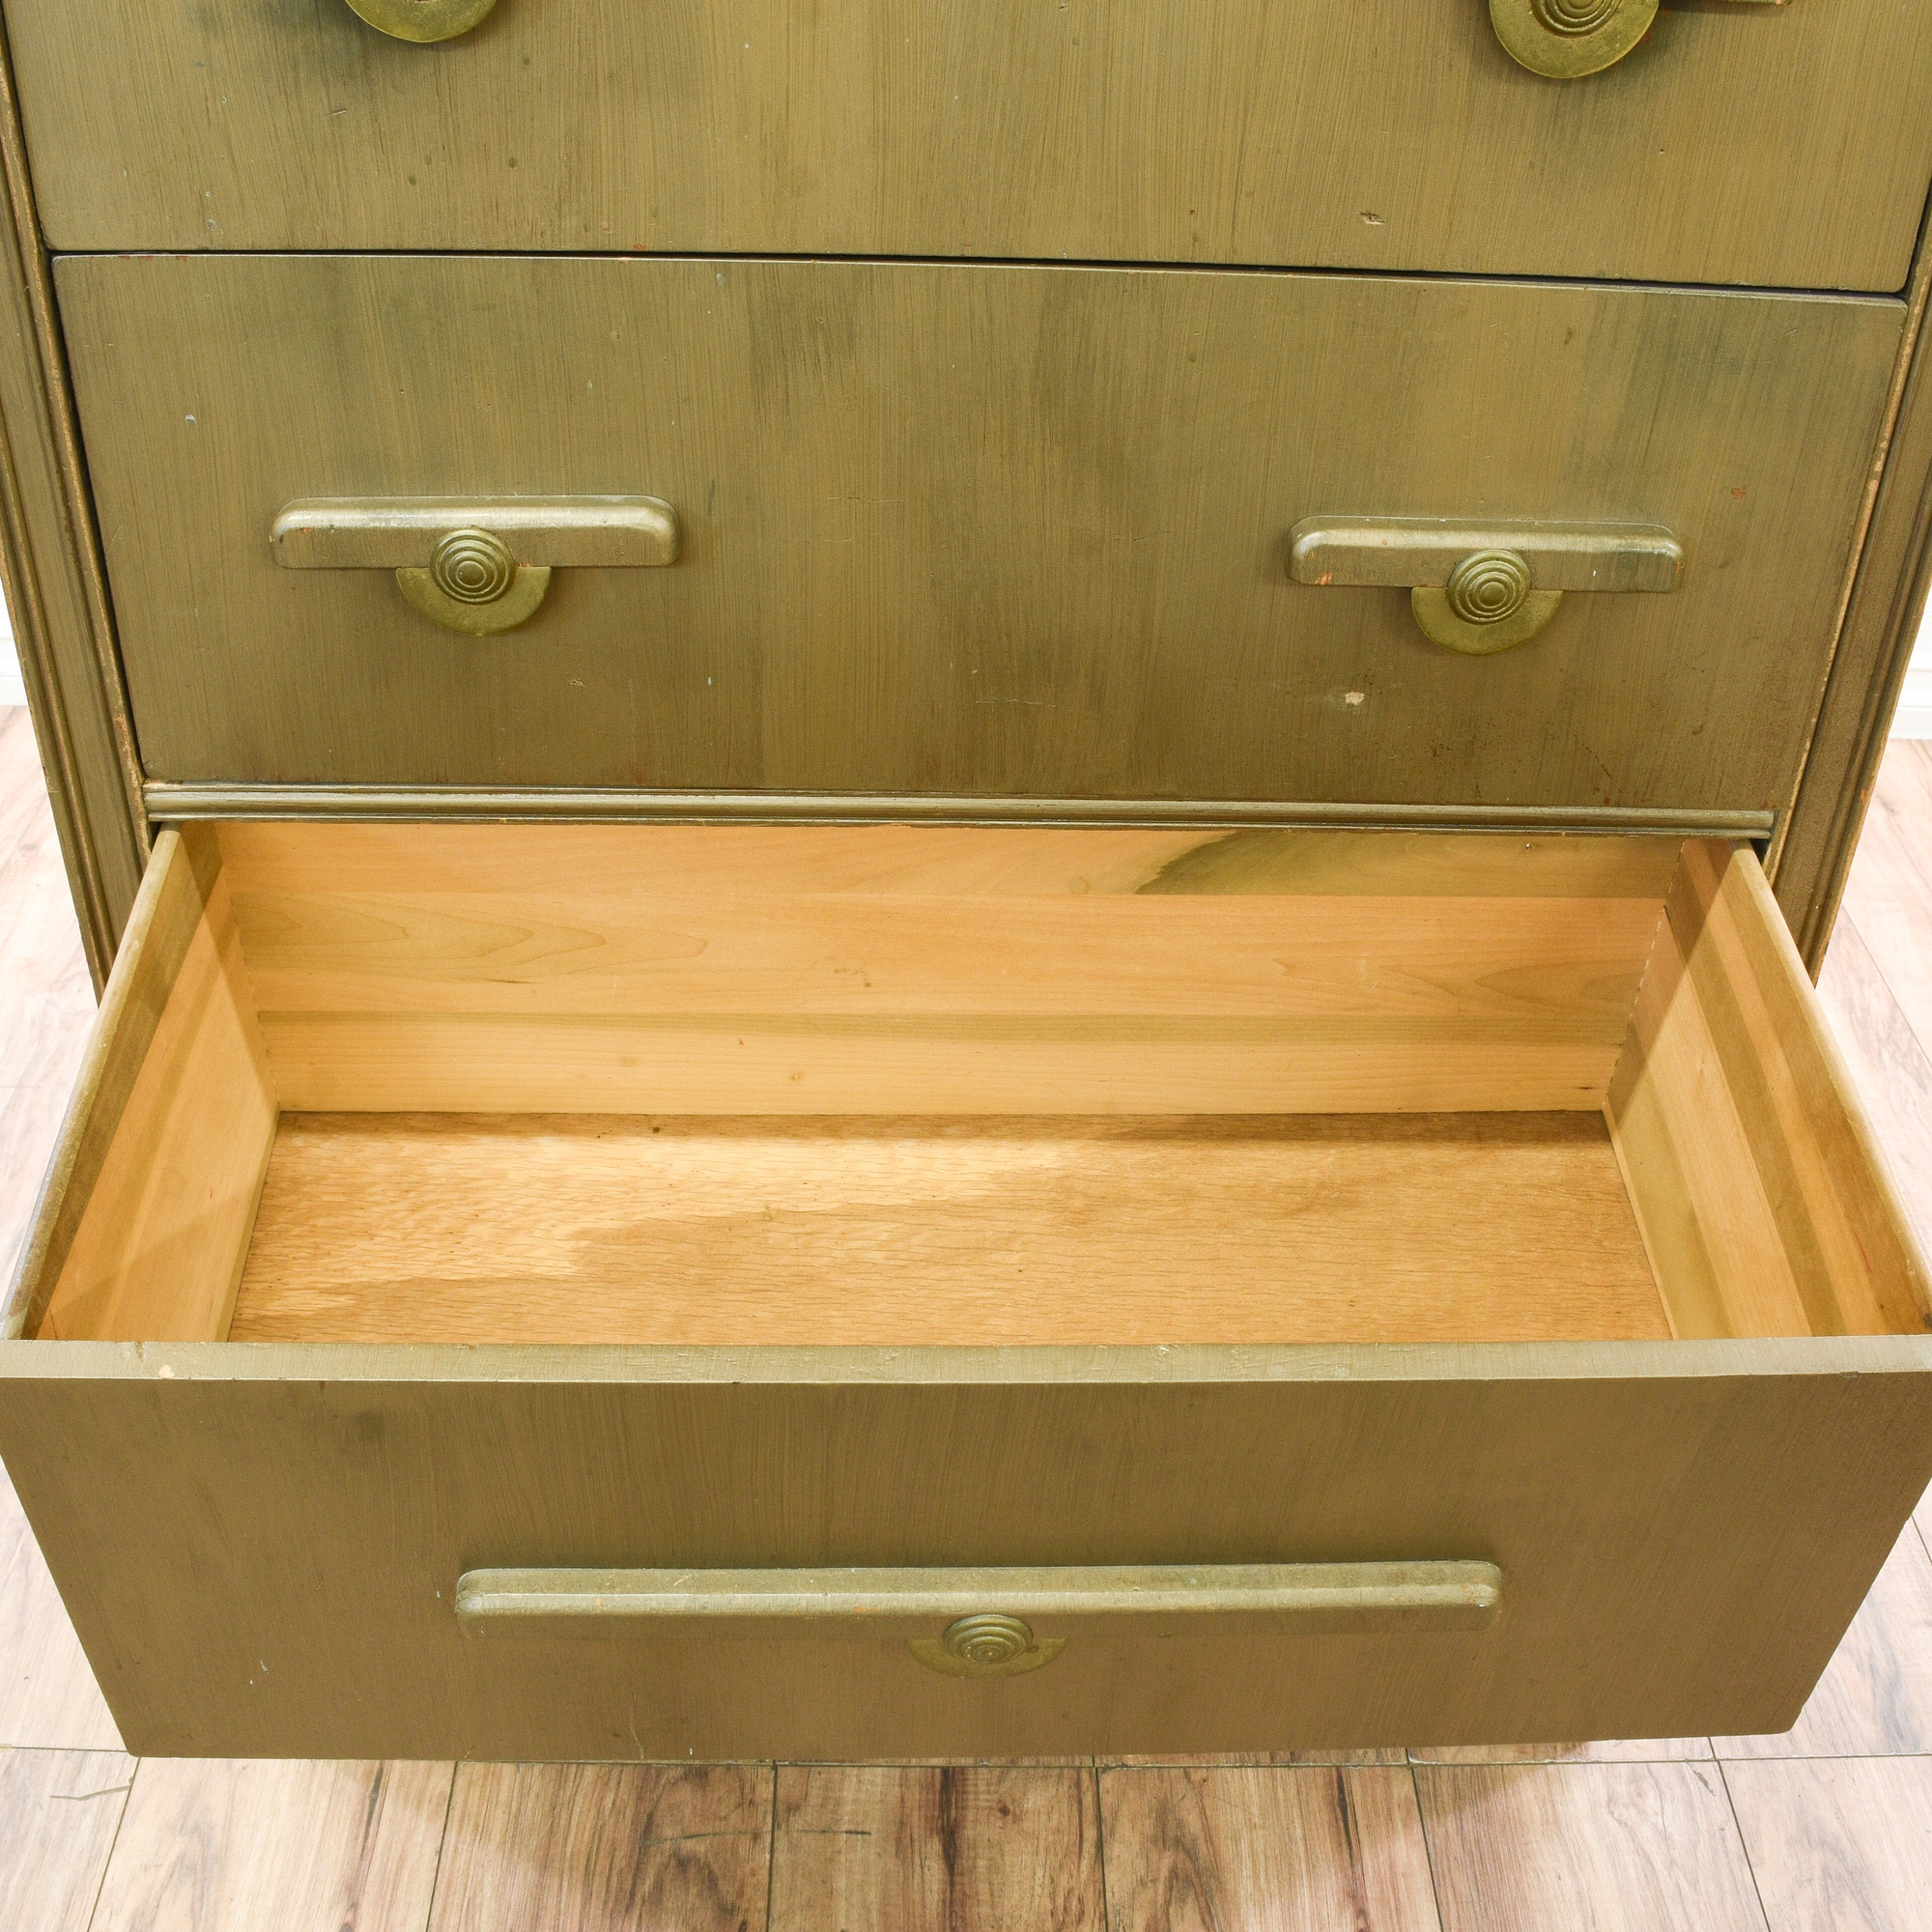 Forsyth Art Deco Kitchen Interior Design San Diego: Art Deco Green Stained Chest Of Drawers Dresser